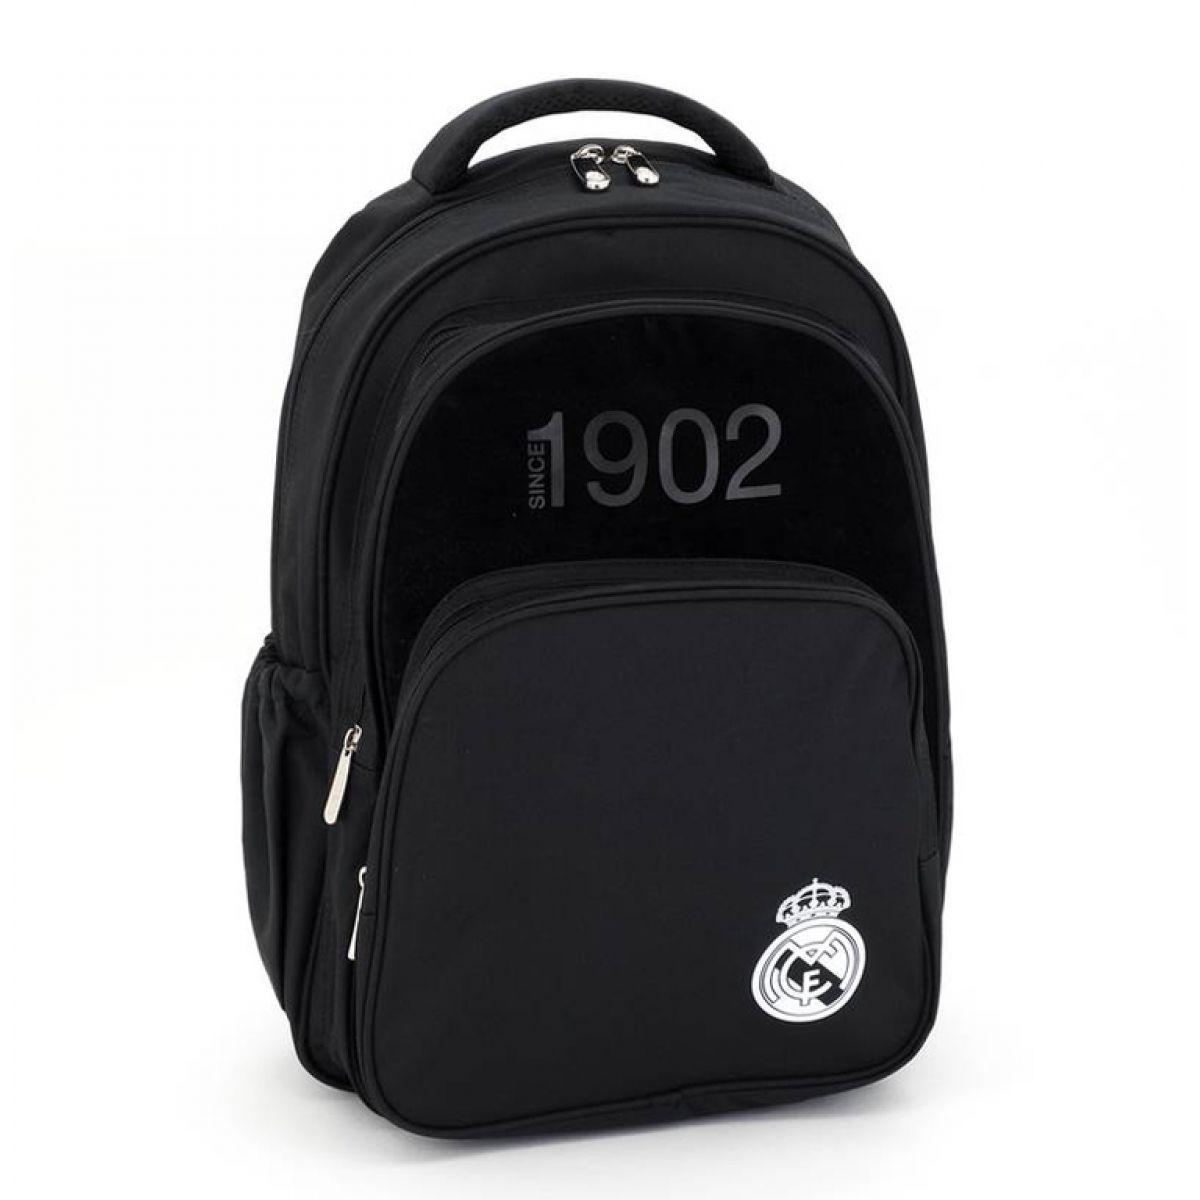 Ars Una Školní batoh Real Madrid black 3 komory